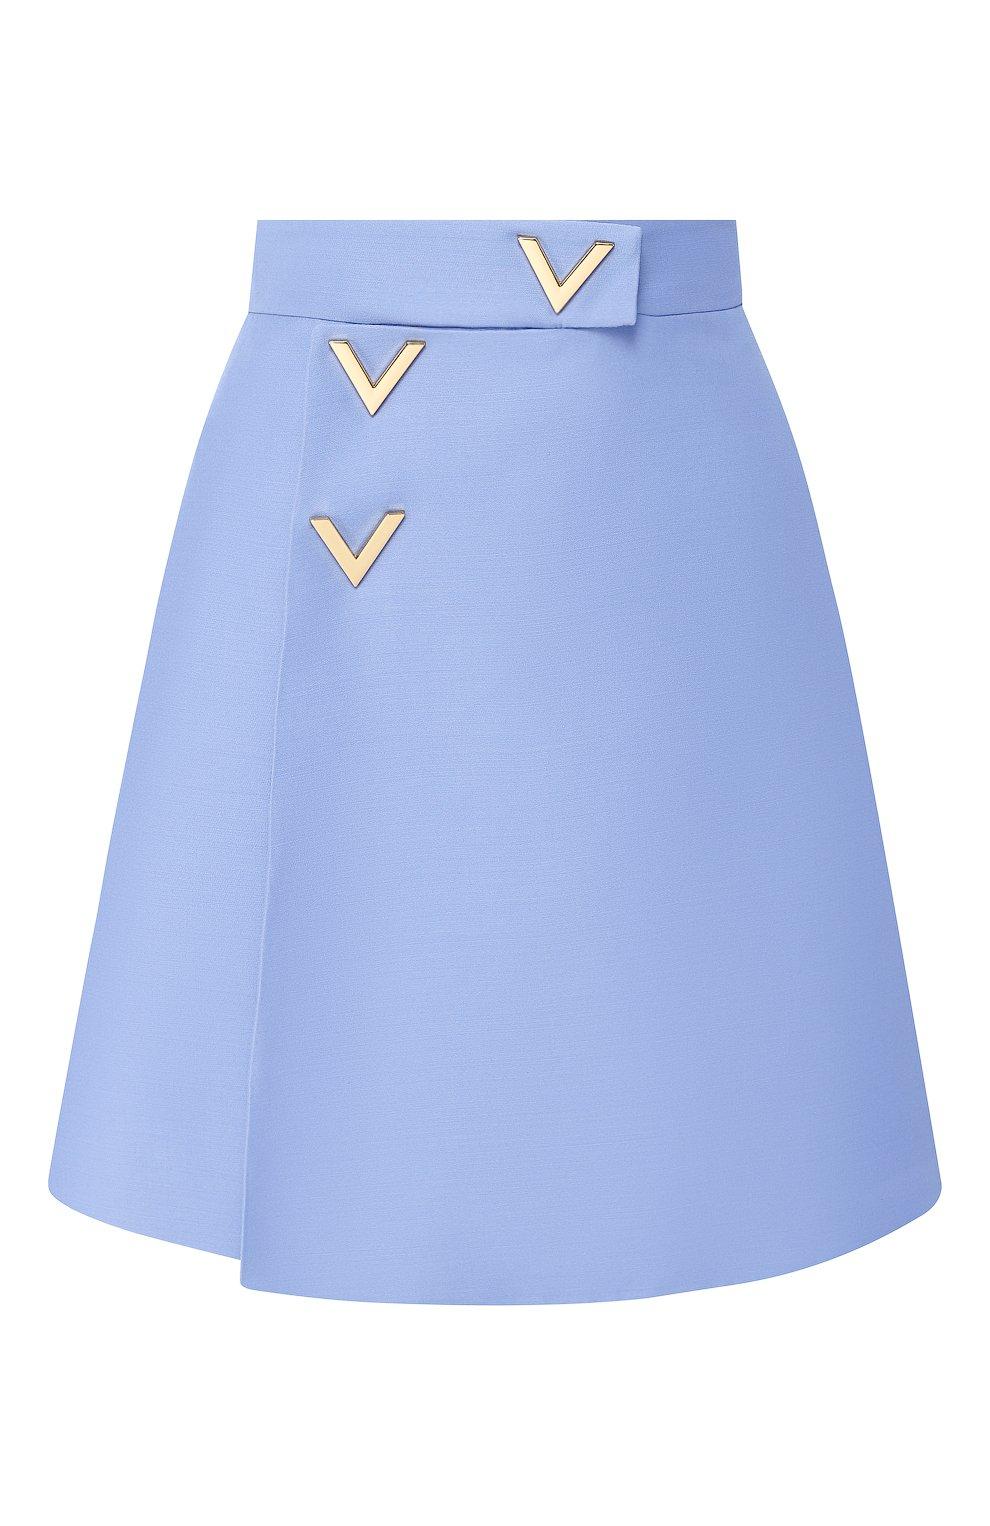 Юбка из смеси шерсти и шелка Valentino голубая | Фото №1